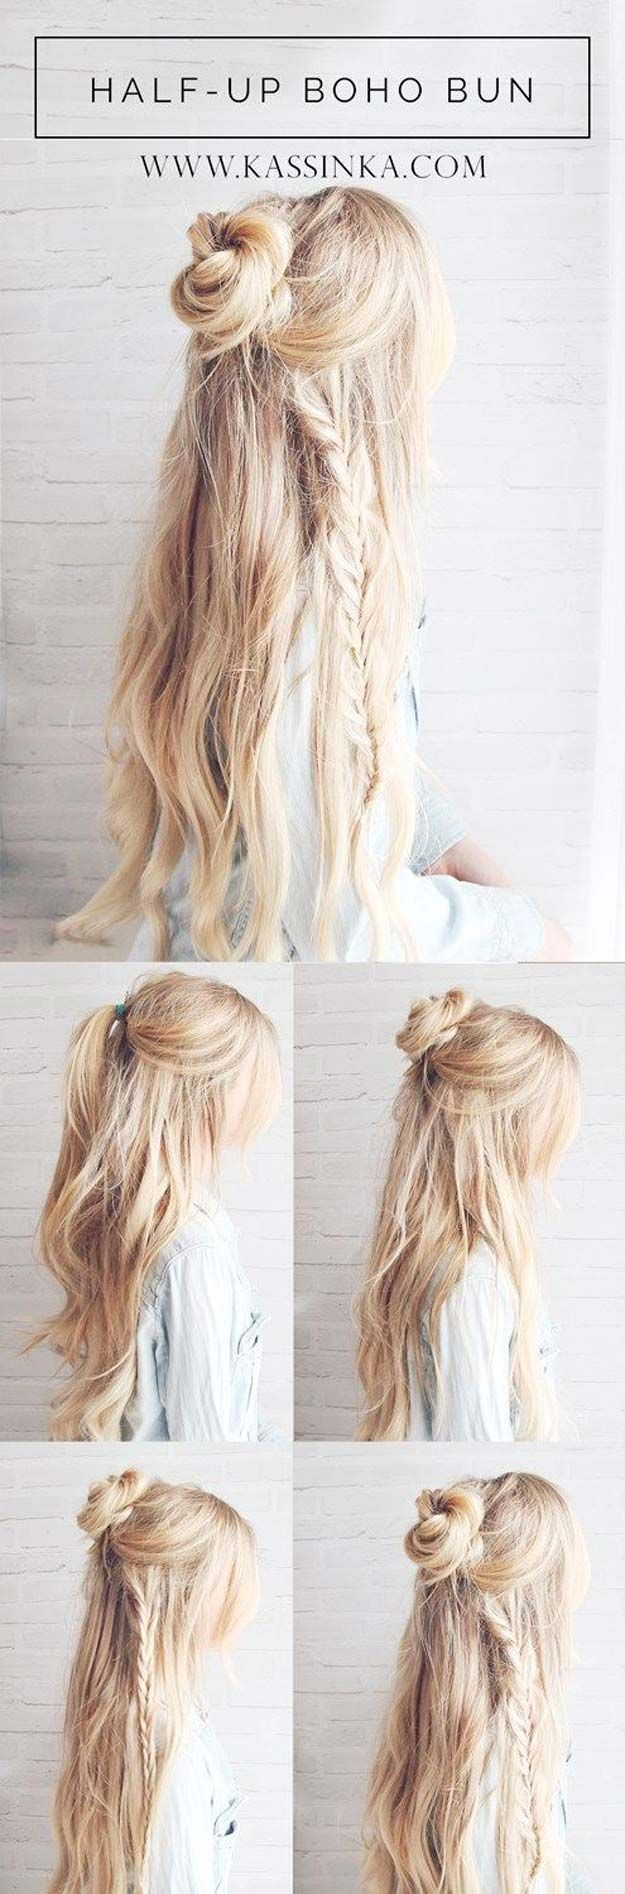 Best hairstyles for long hair boho braided bun hair step by step